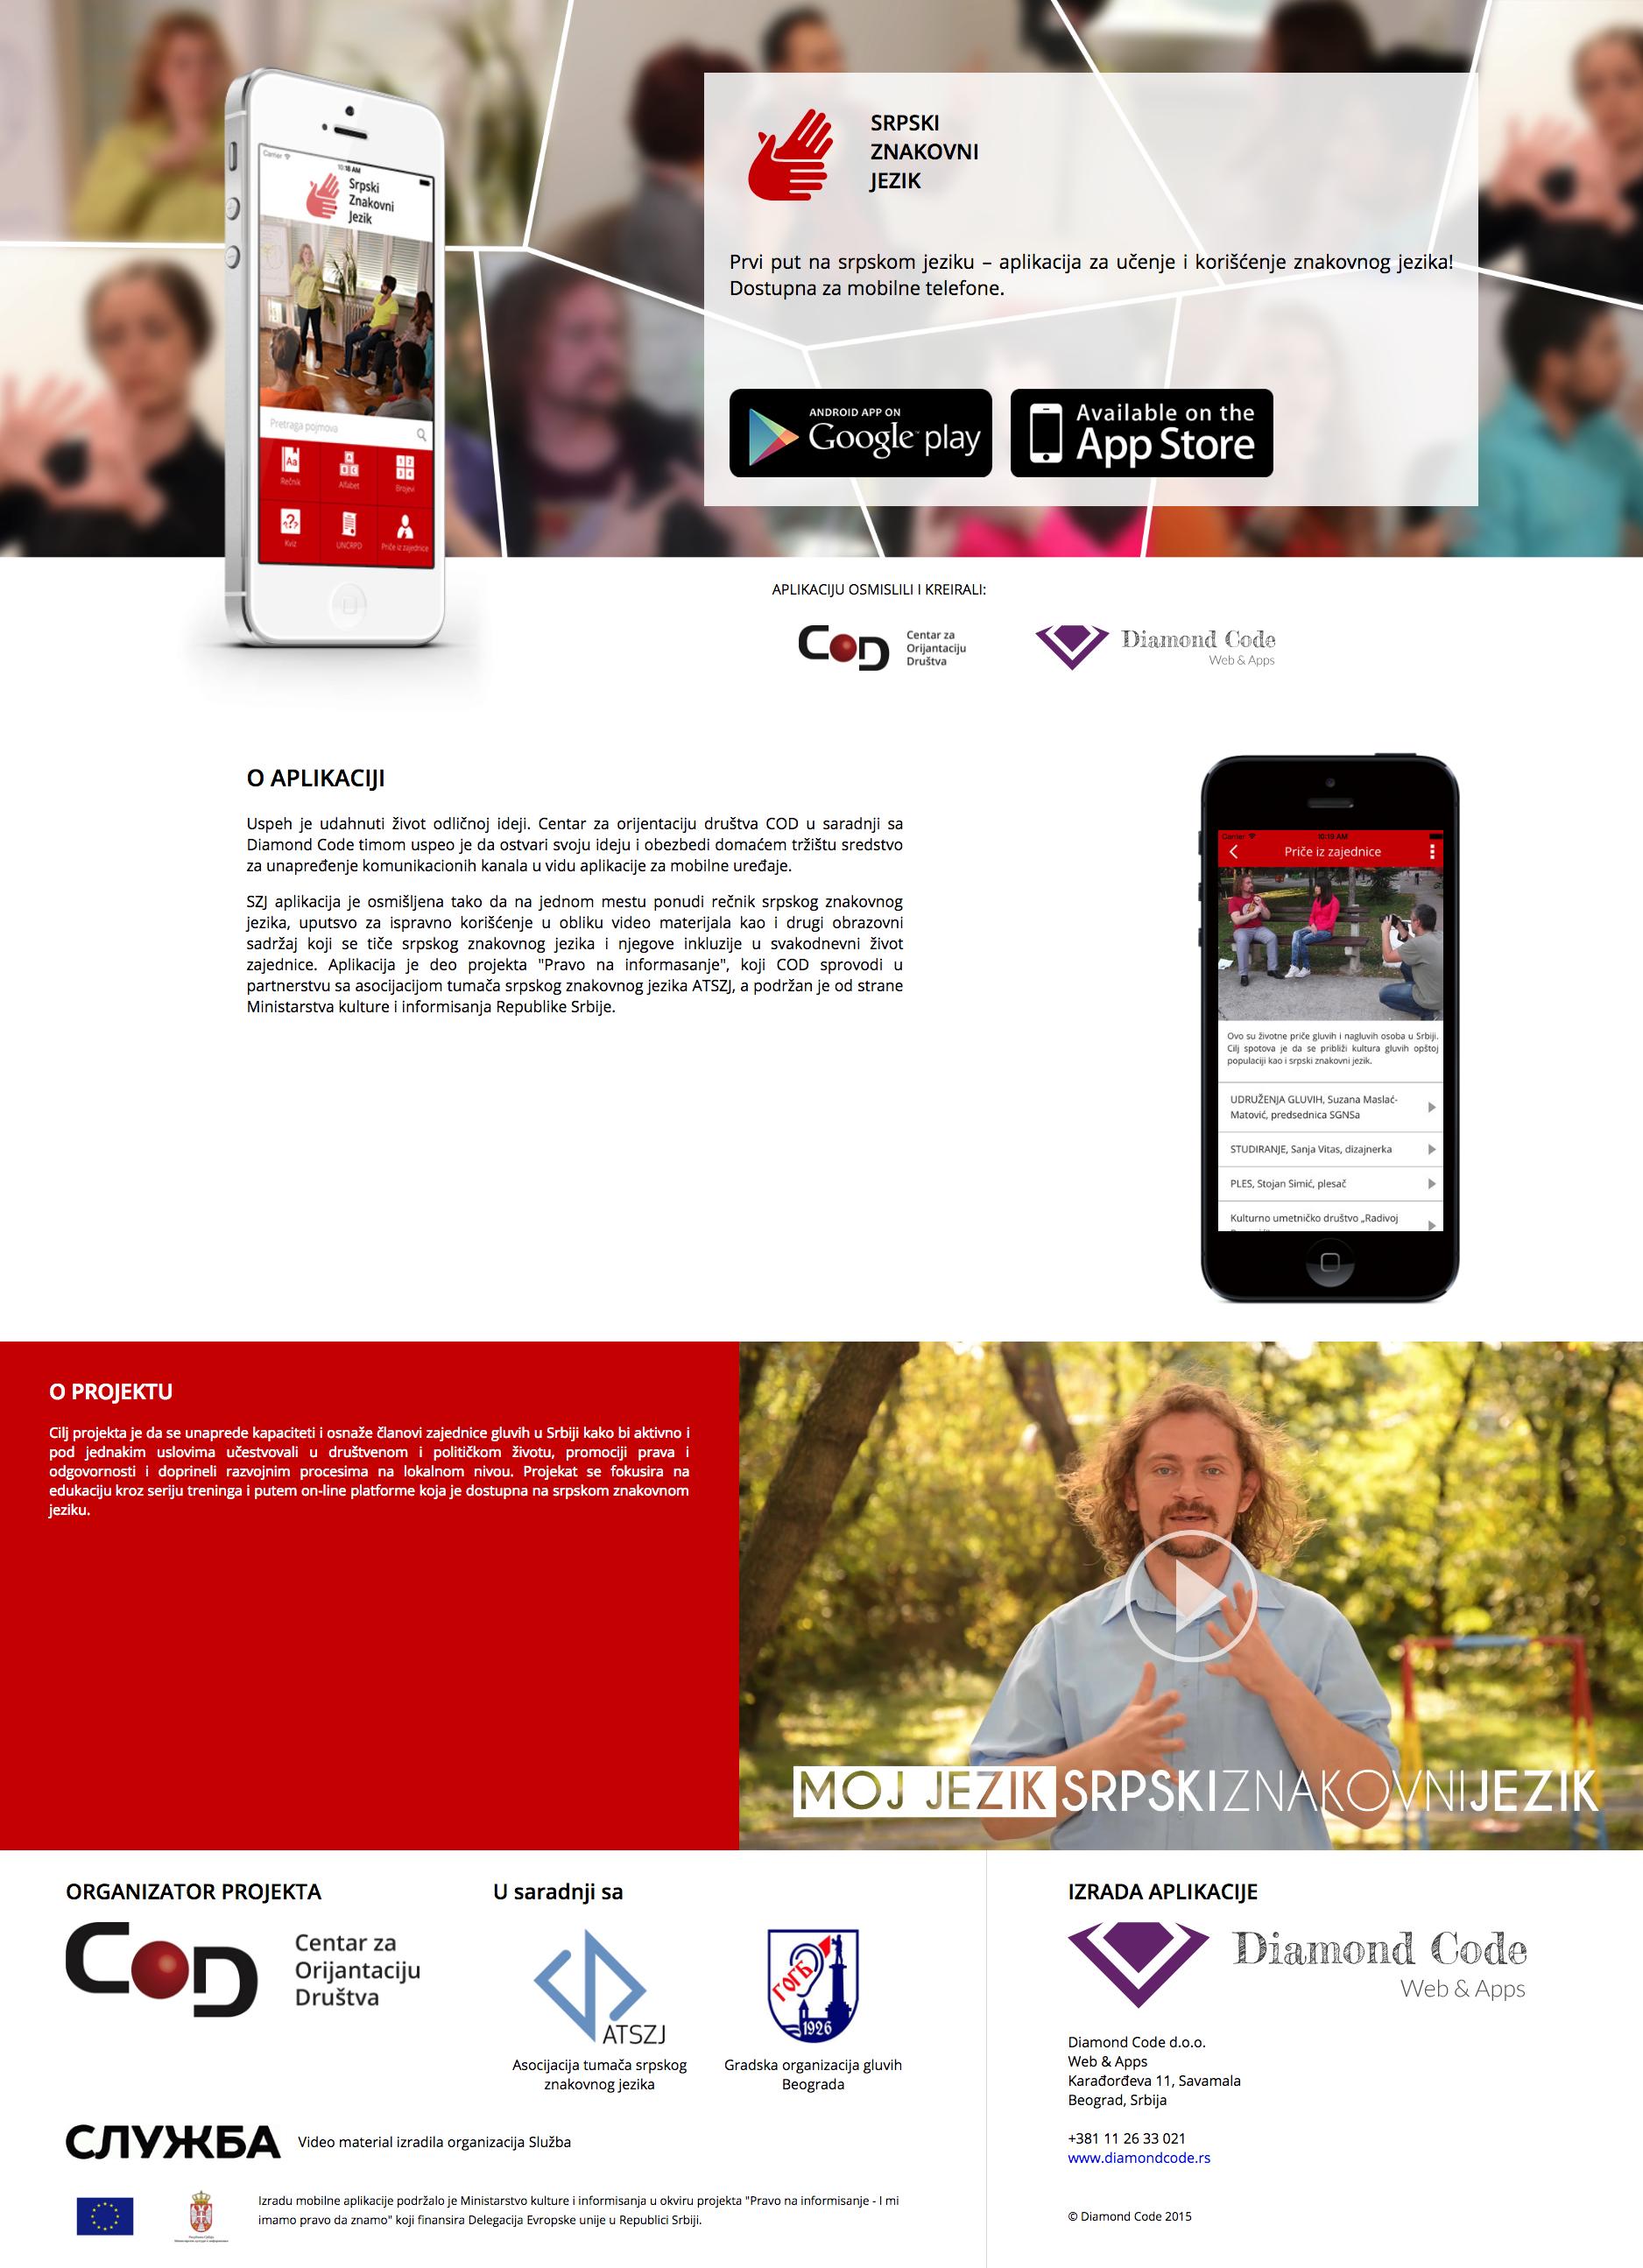 SZJ App and Website